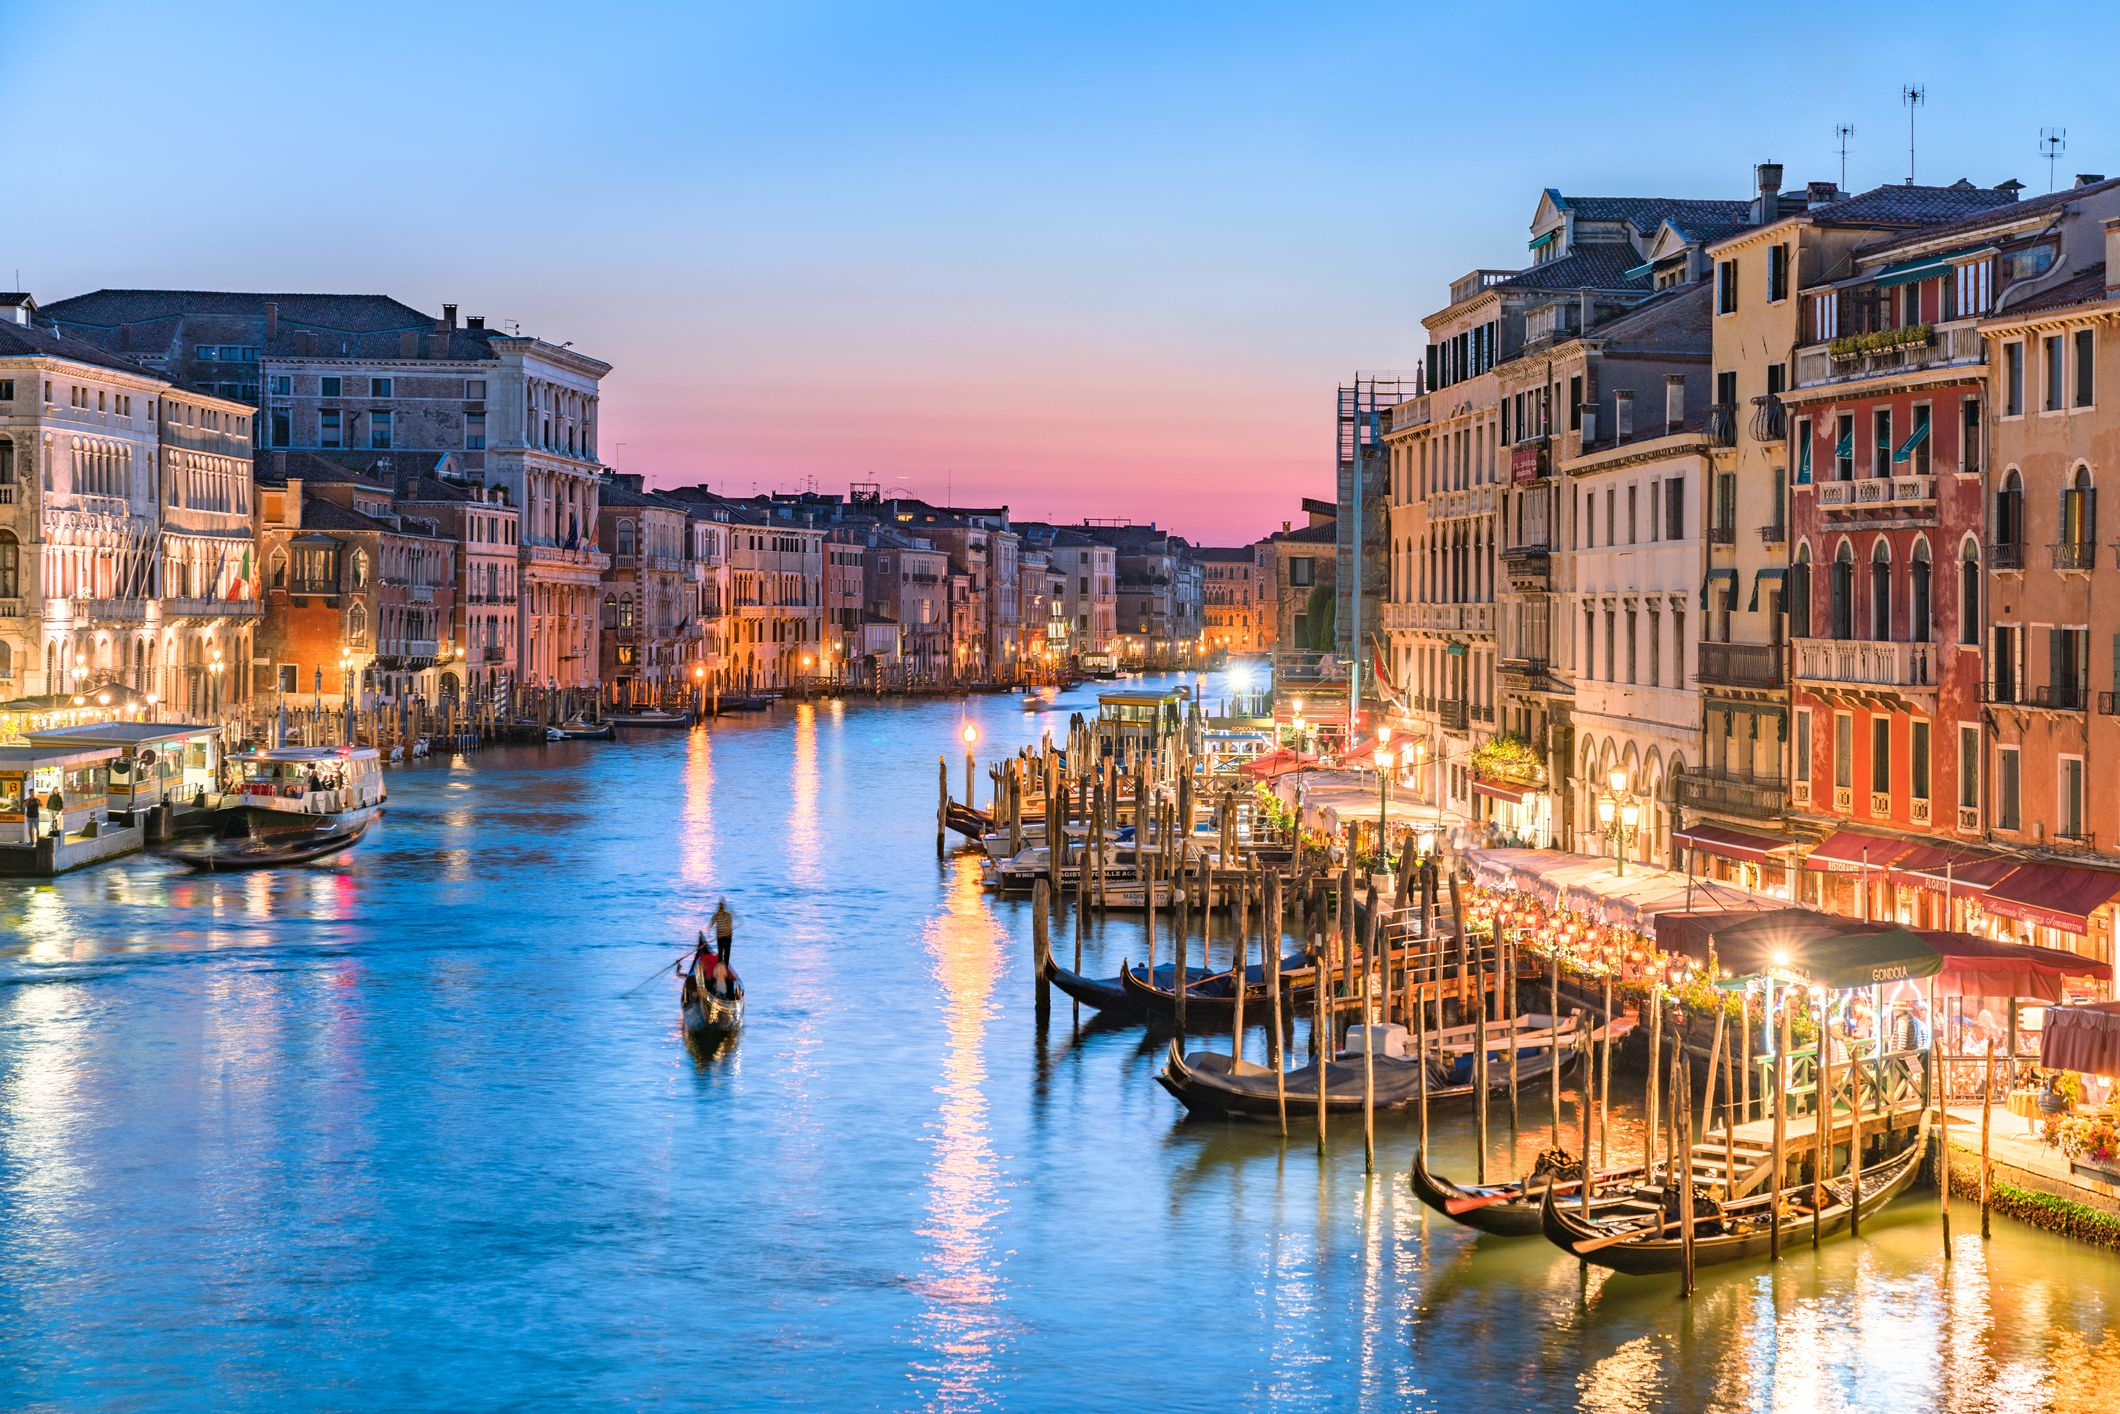 Angélique C, Venice Italy